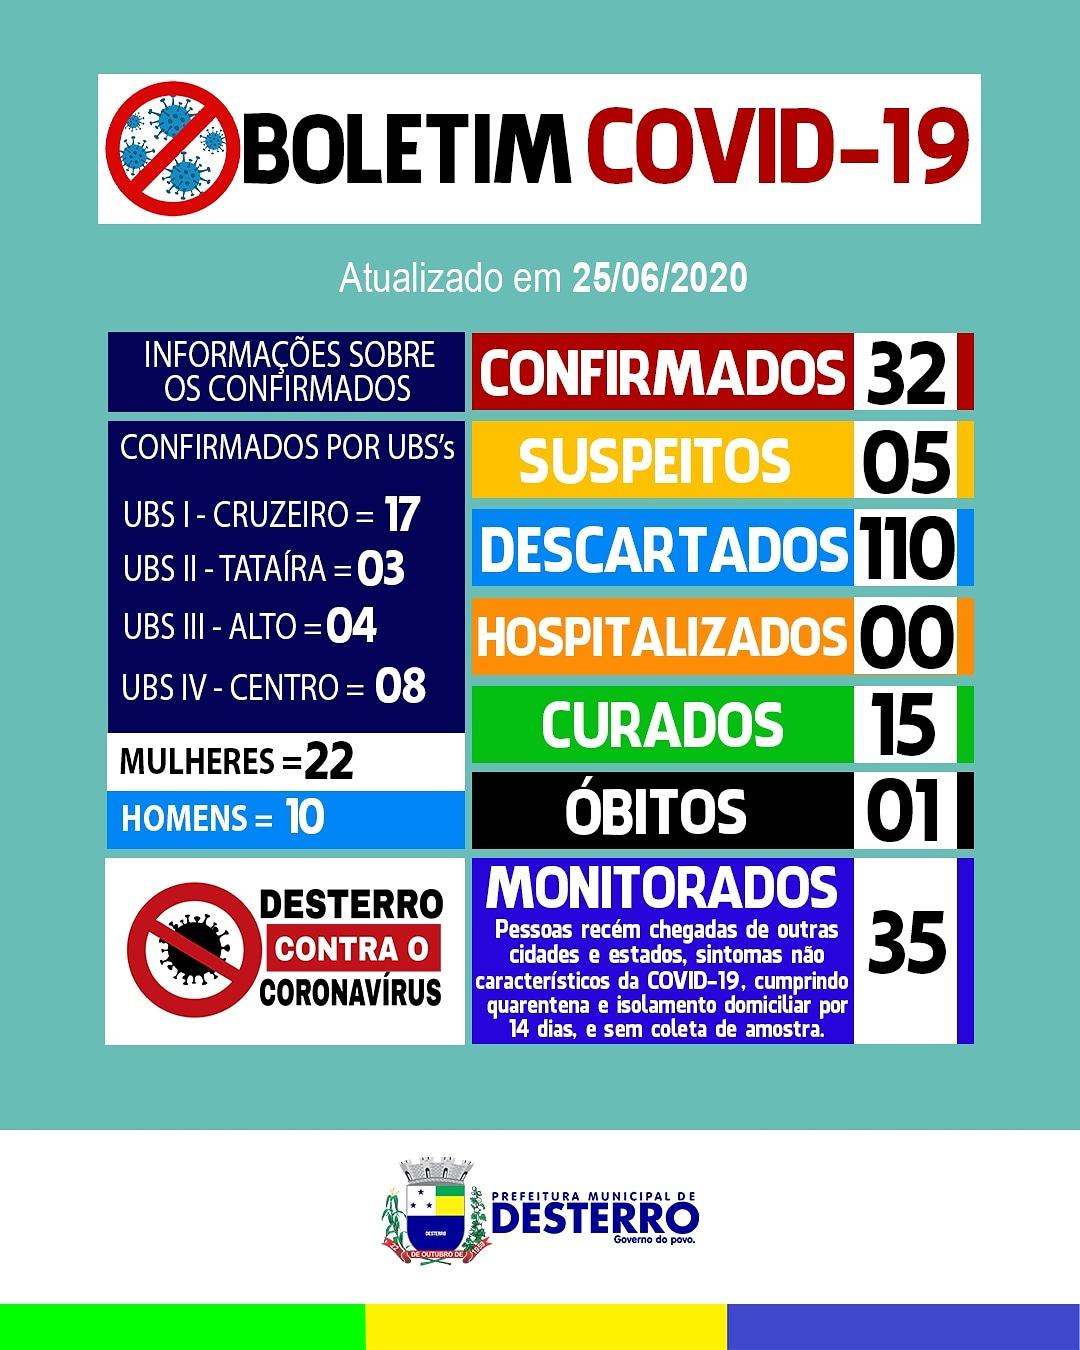 Boletim Covid-19 (25/06/2020)